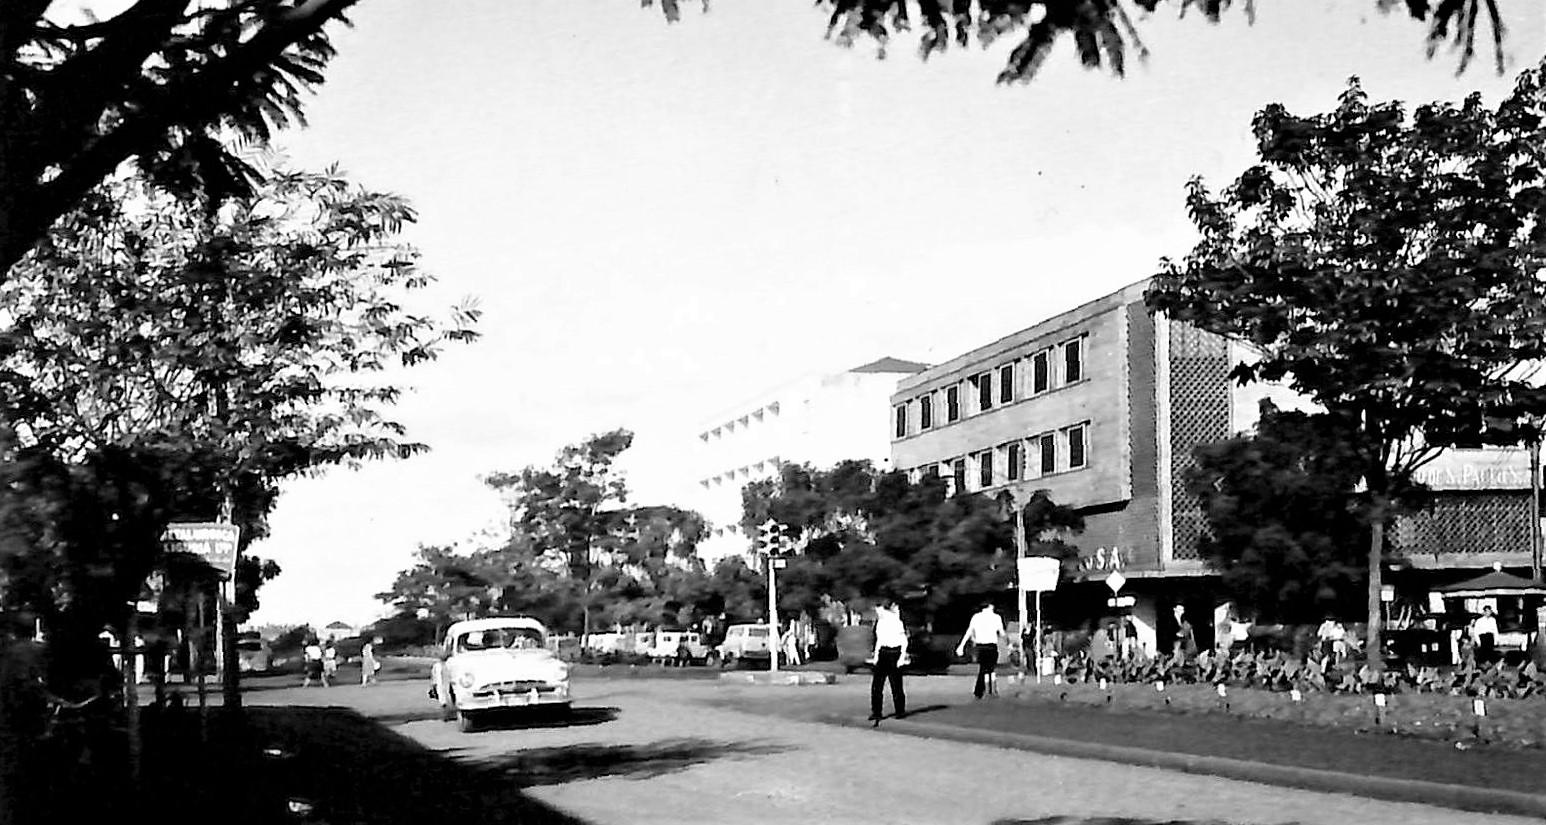 Avenida Brasil - Início dos anos 1960